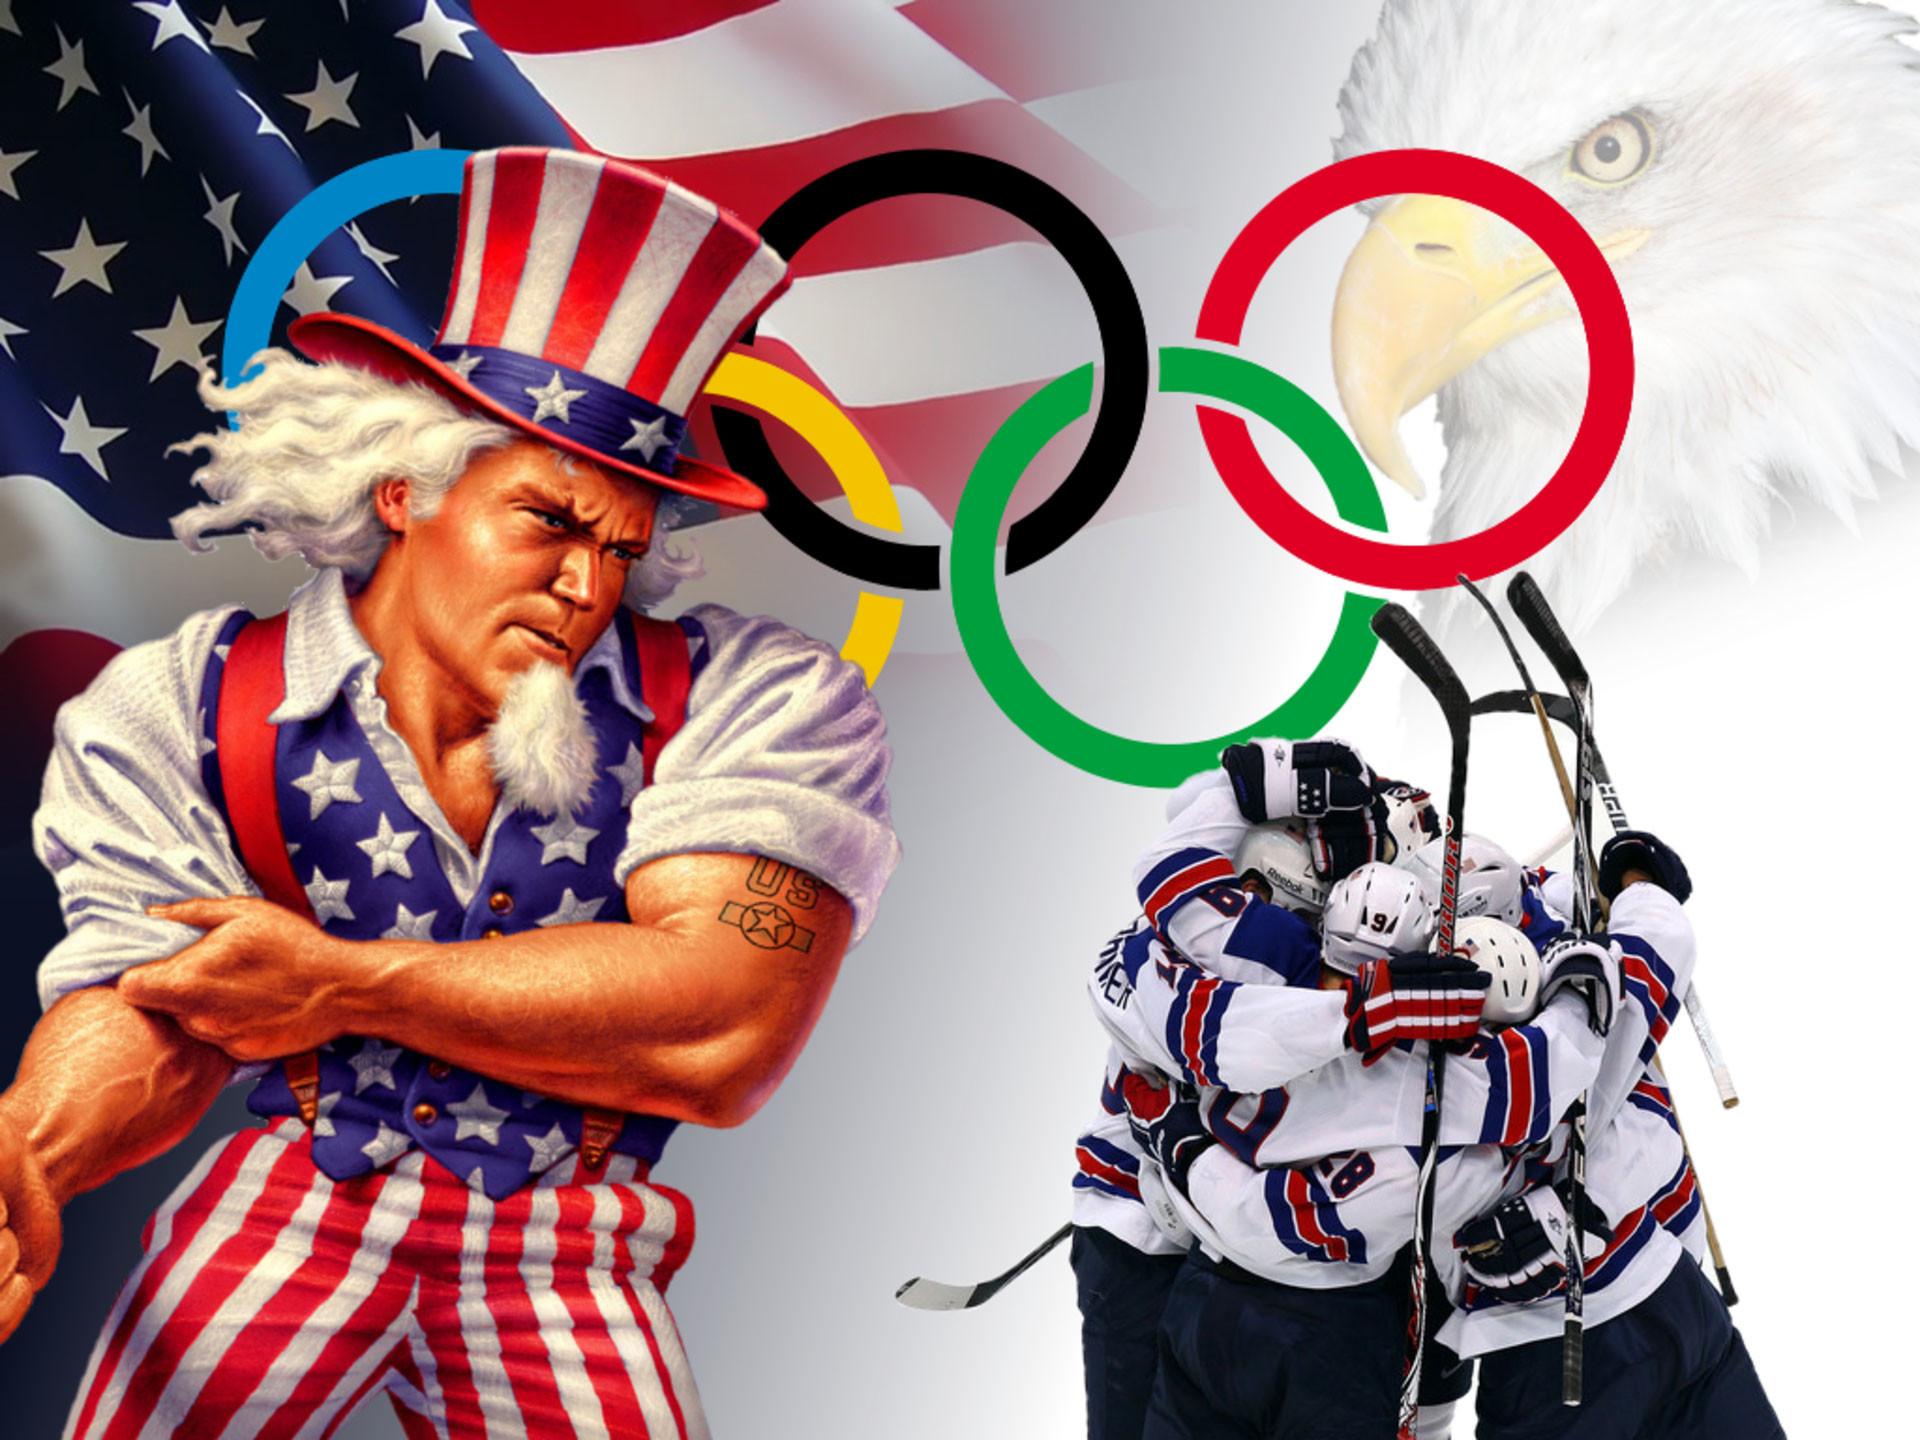 Res: 1920x1440, USA Hockey Team 2014 Winter Olympics Wallpaper